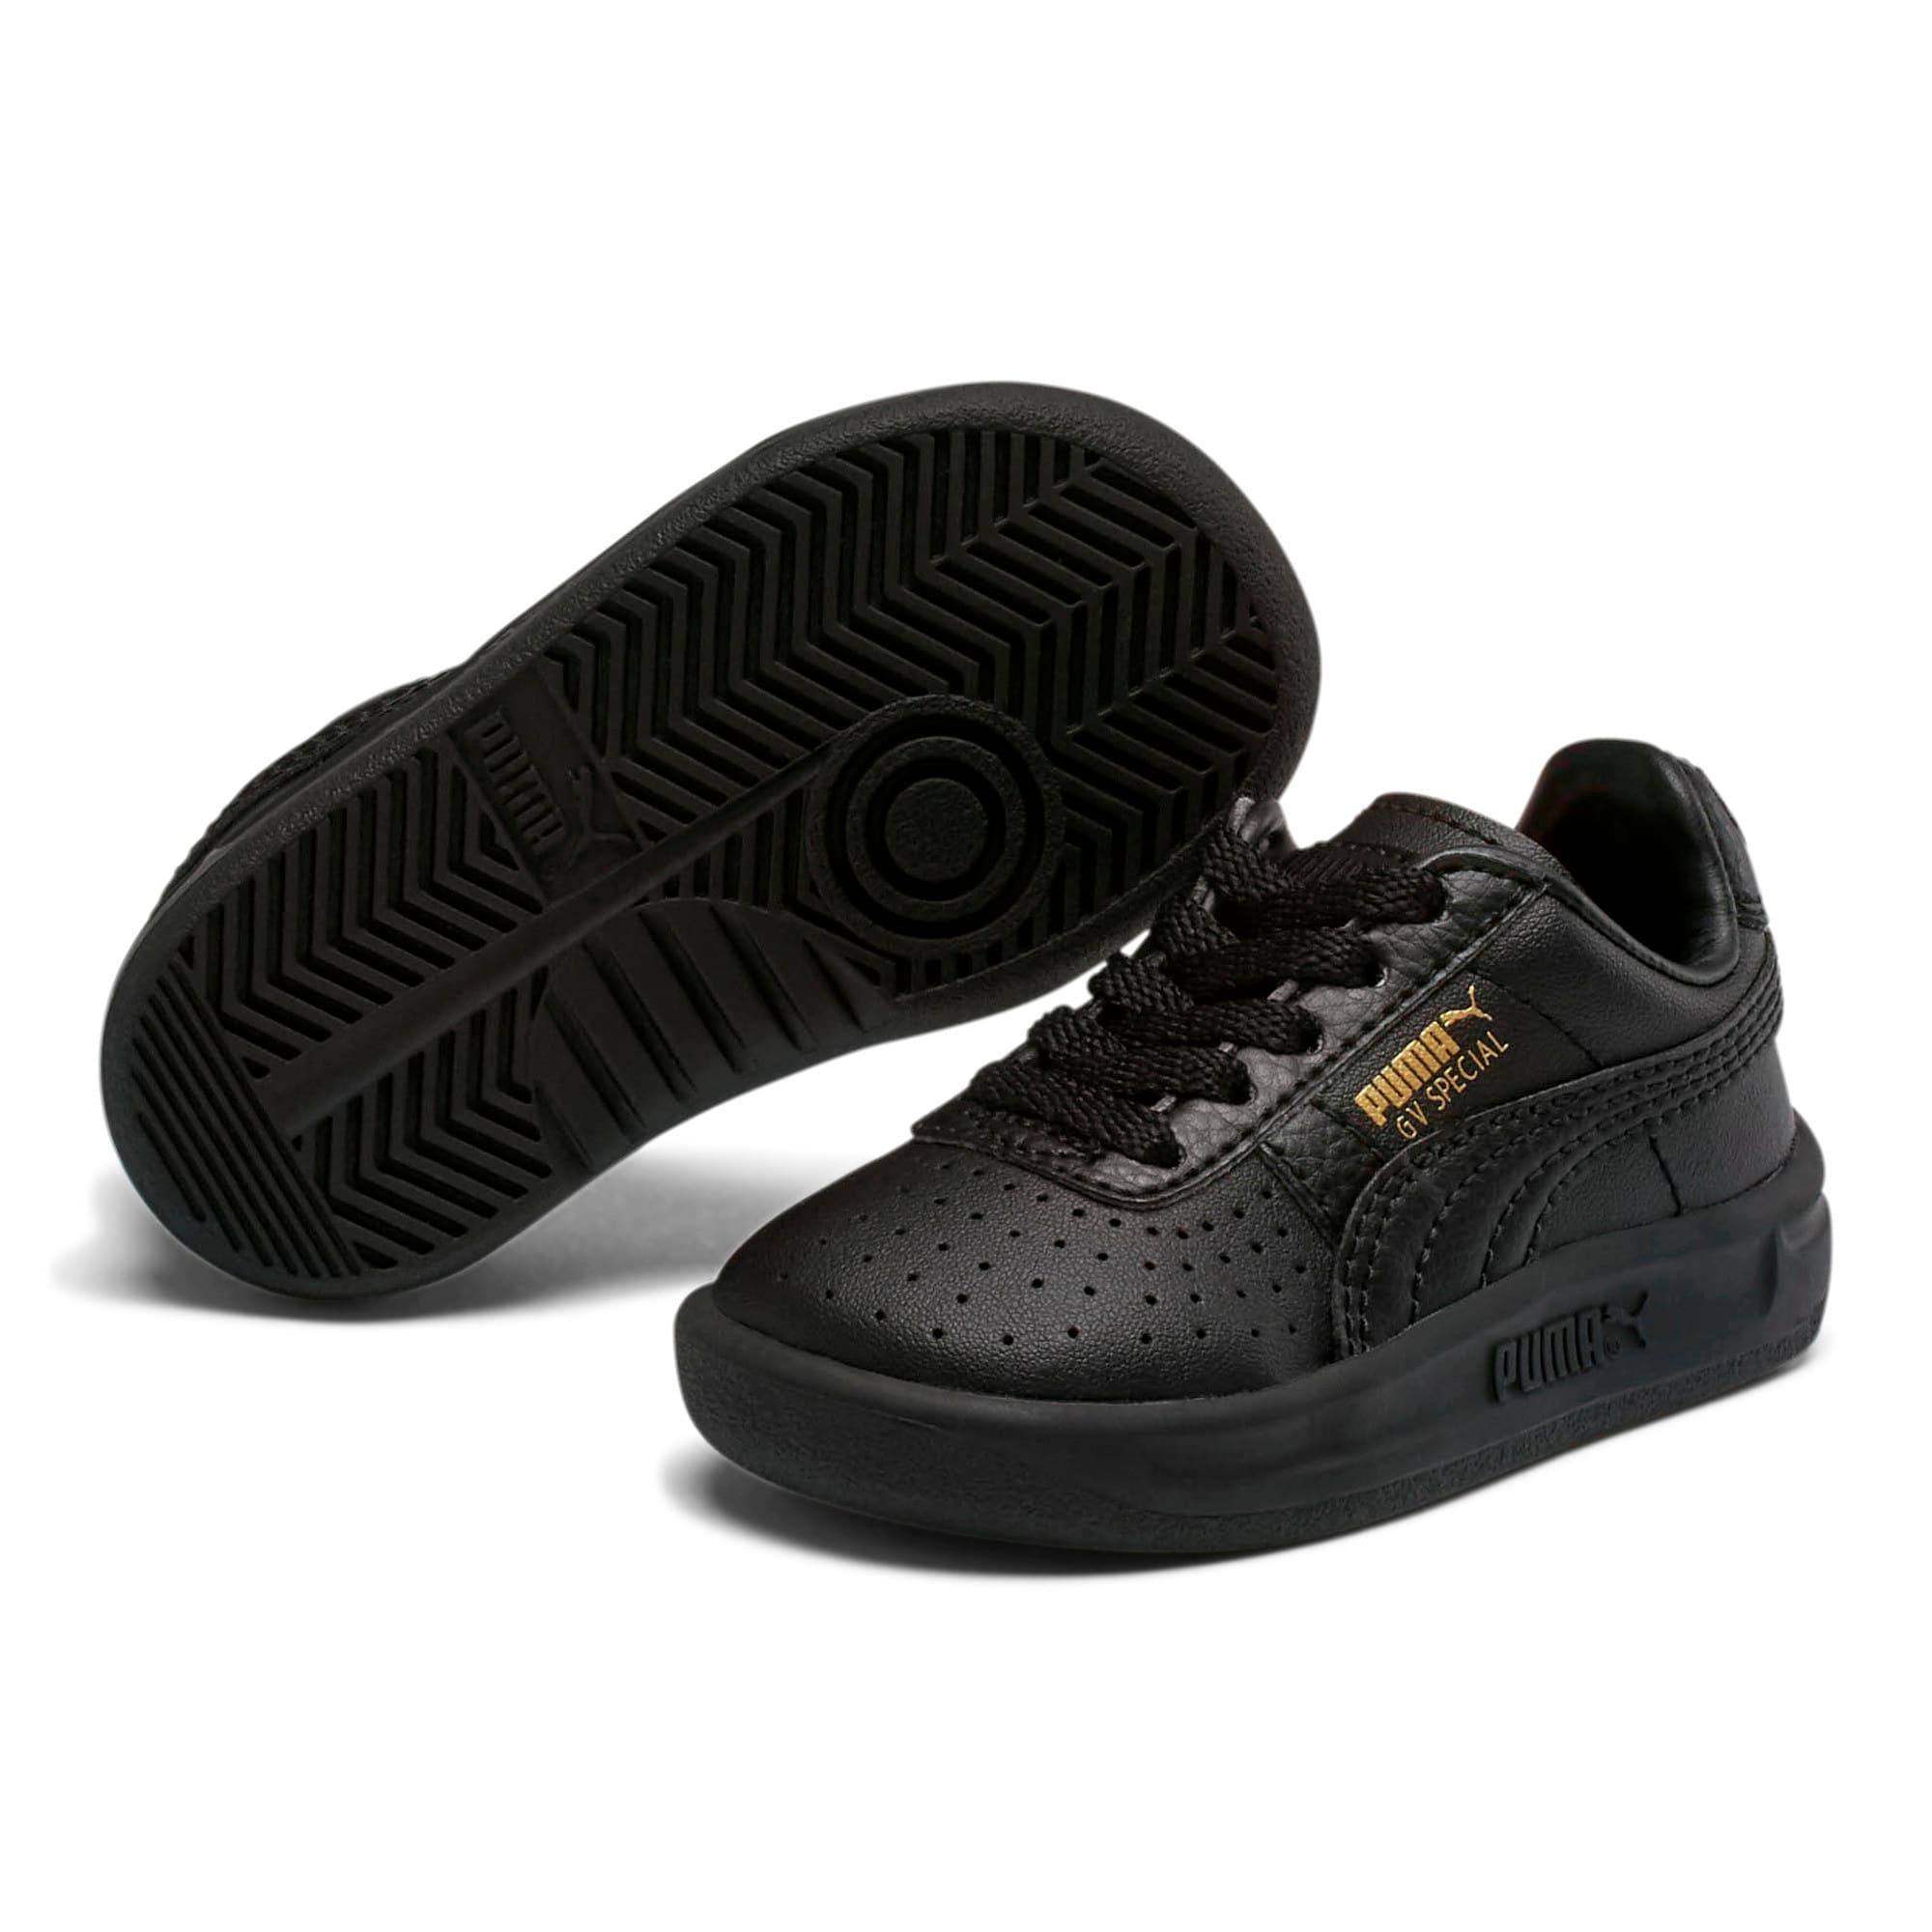 Thumbnail 2 of GV Special Toddler Shoes, Puma Black-Puma Team Gold, medium